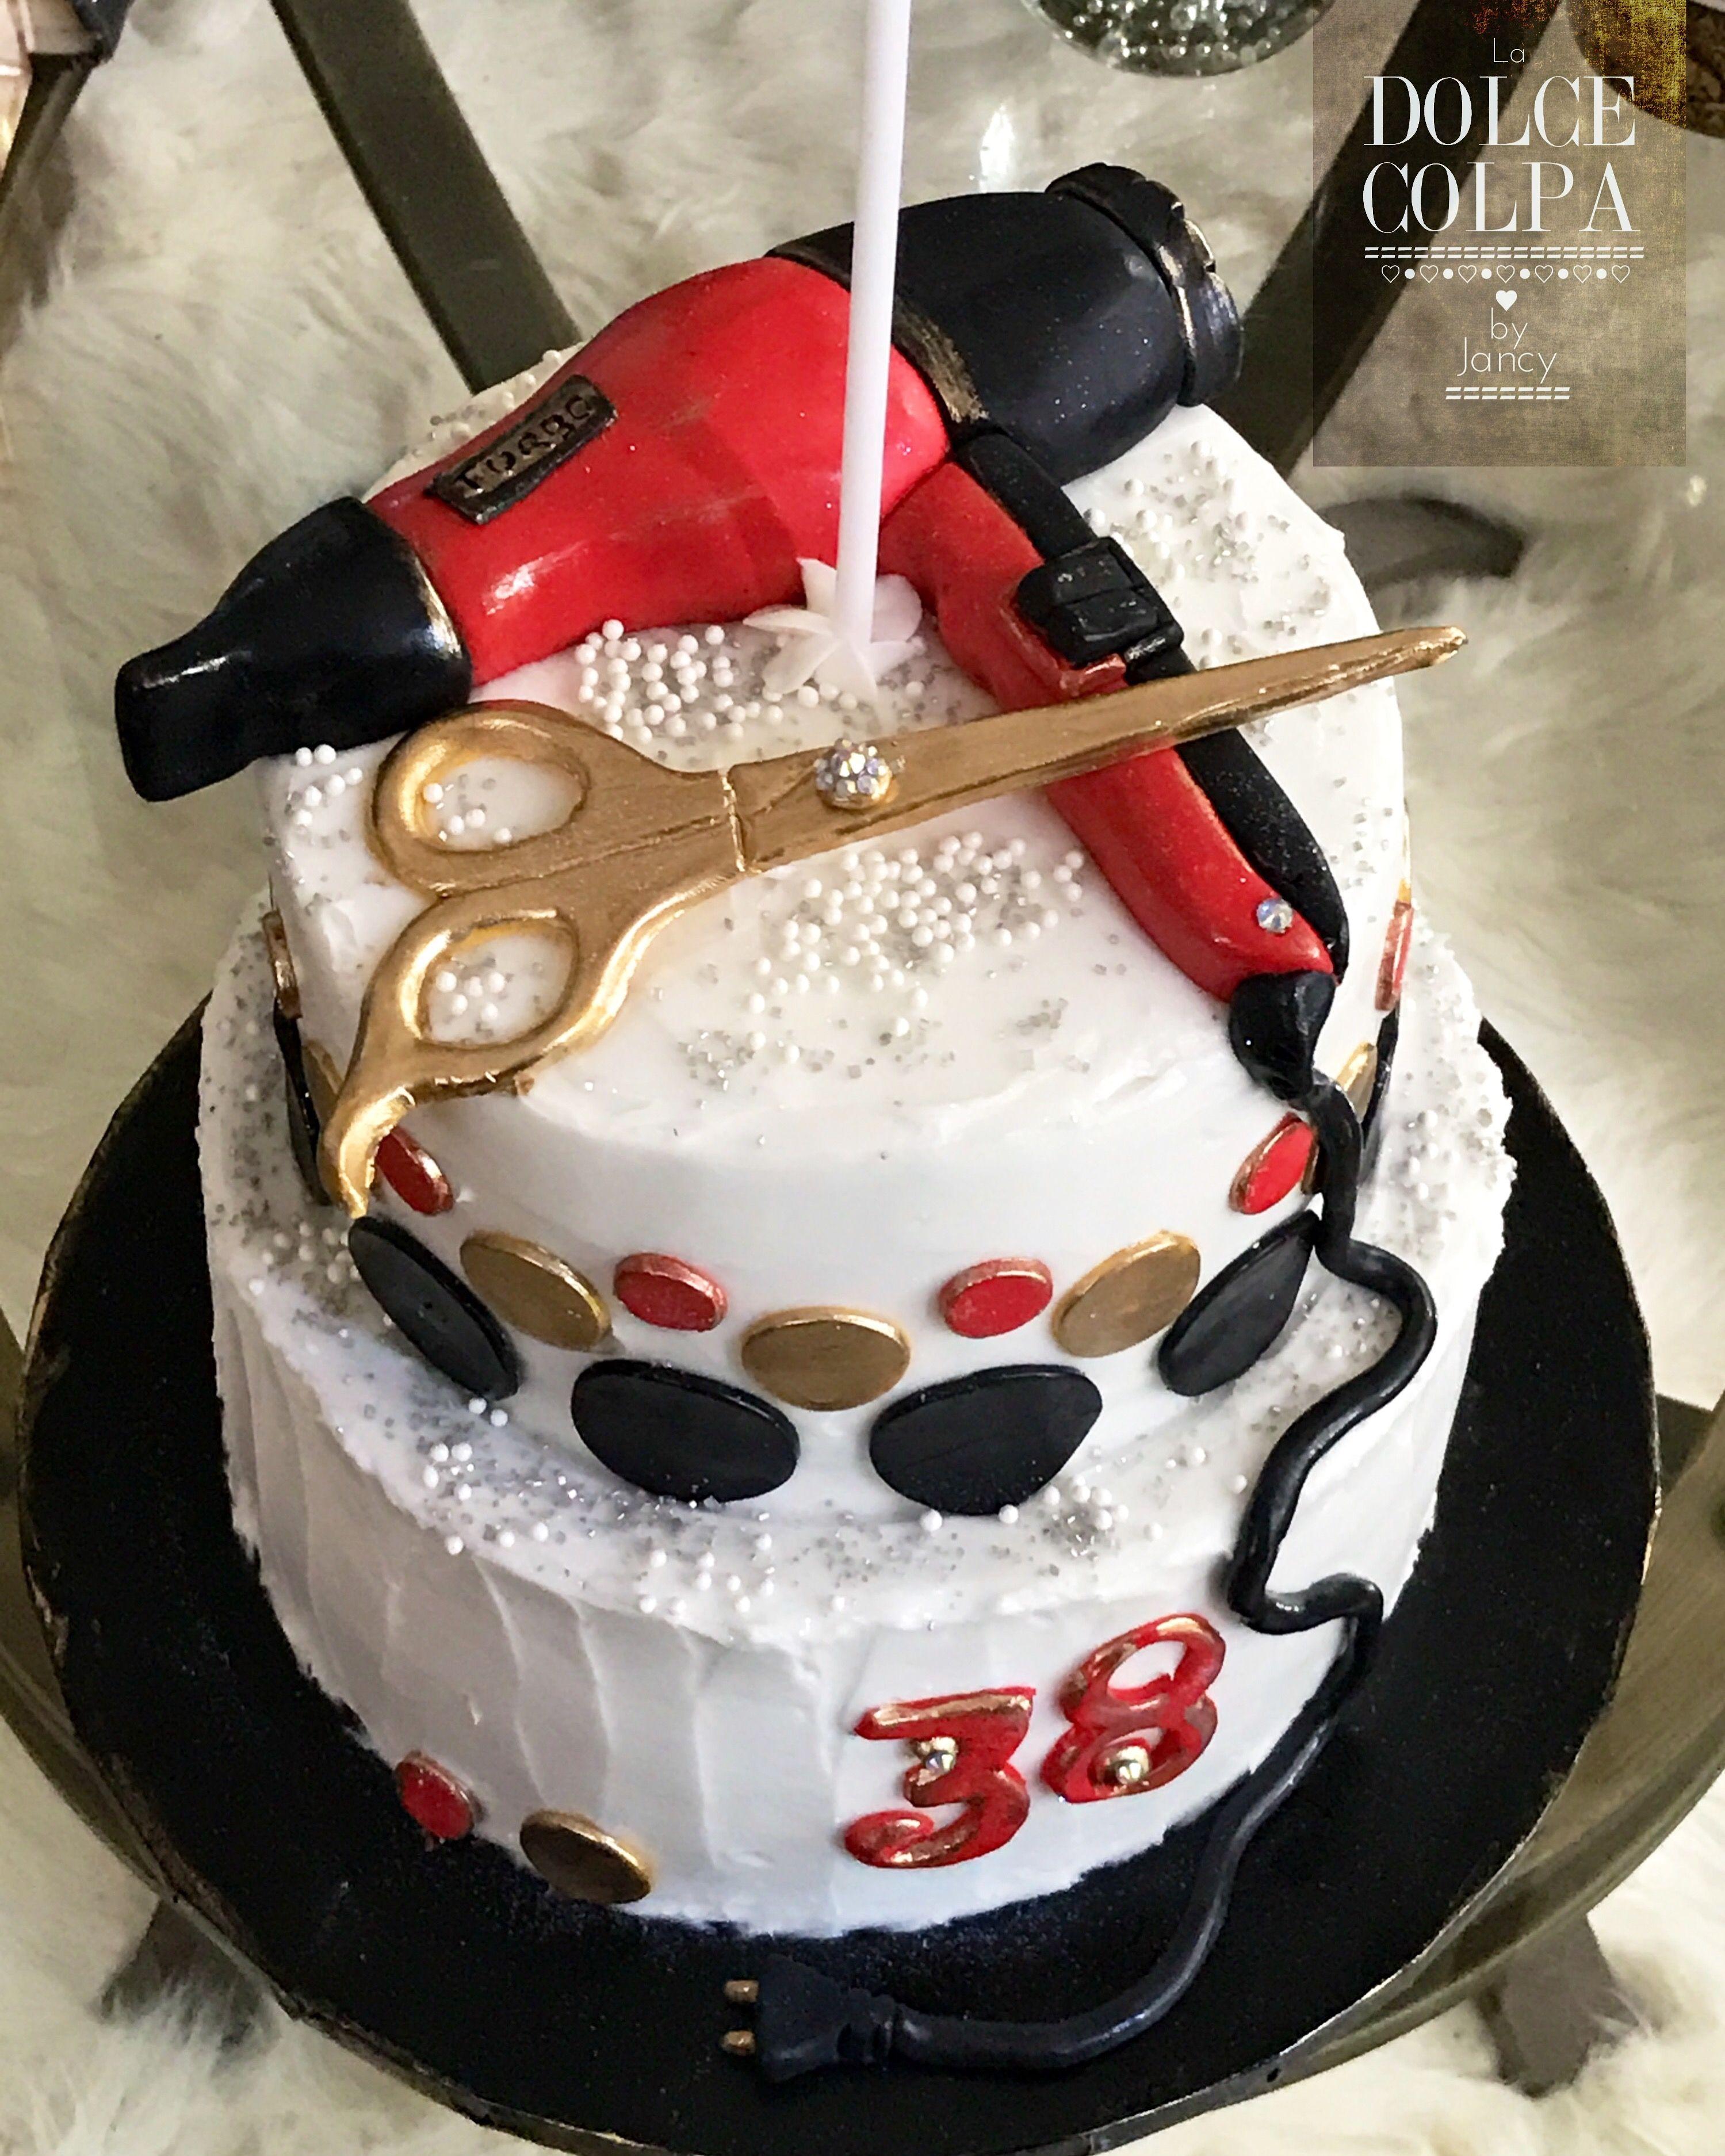 Hair Stylist Theme Birthday Cake by LA DOLCE COLPA  Cake, Cake